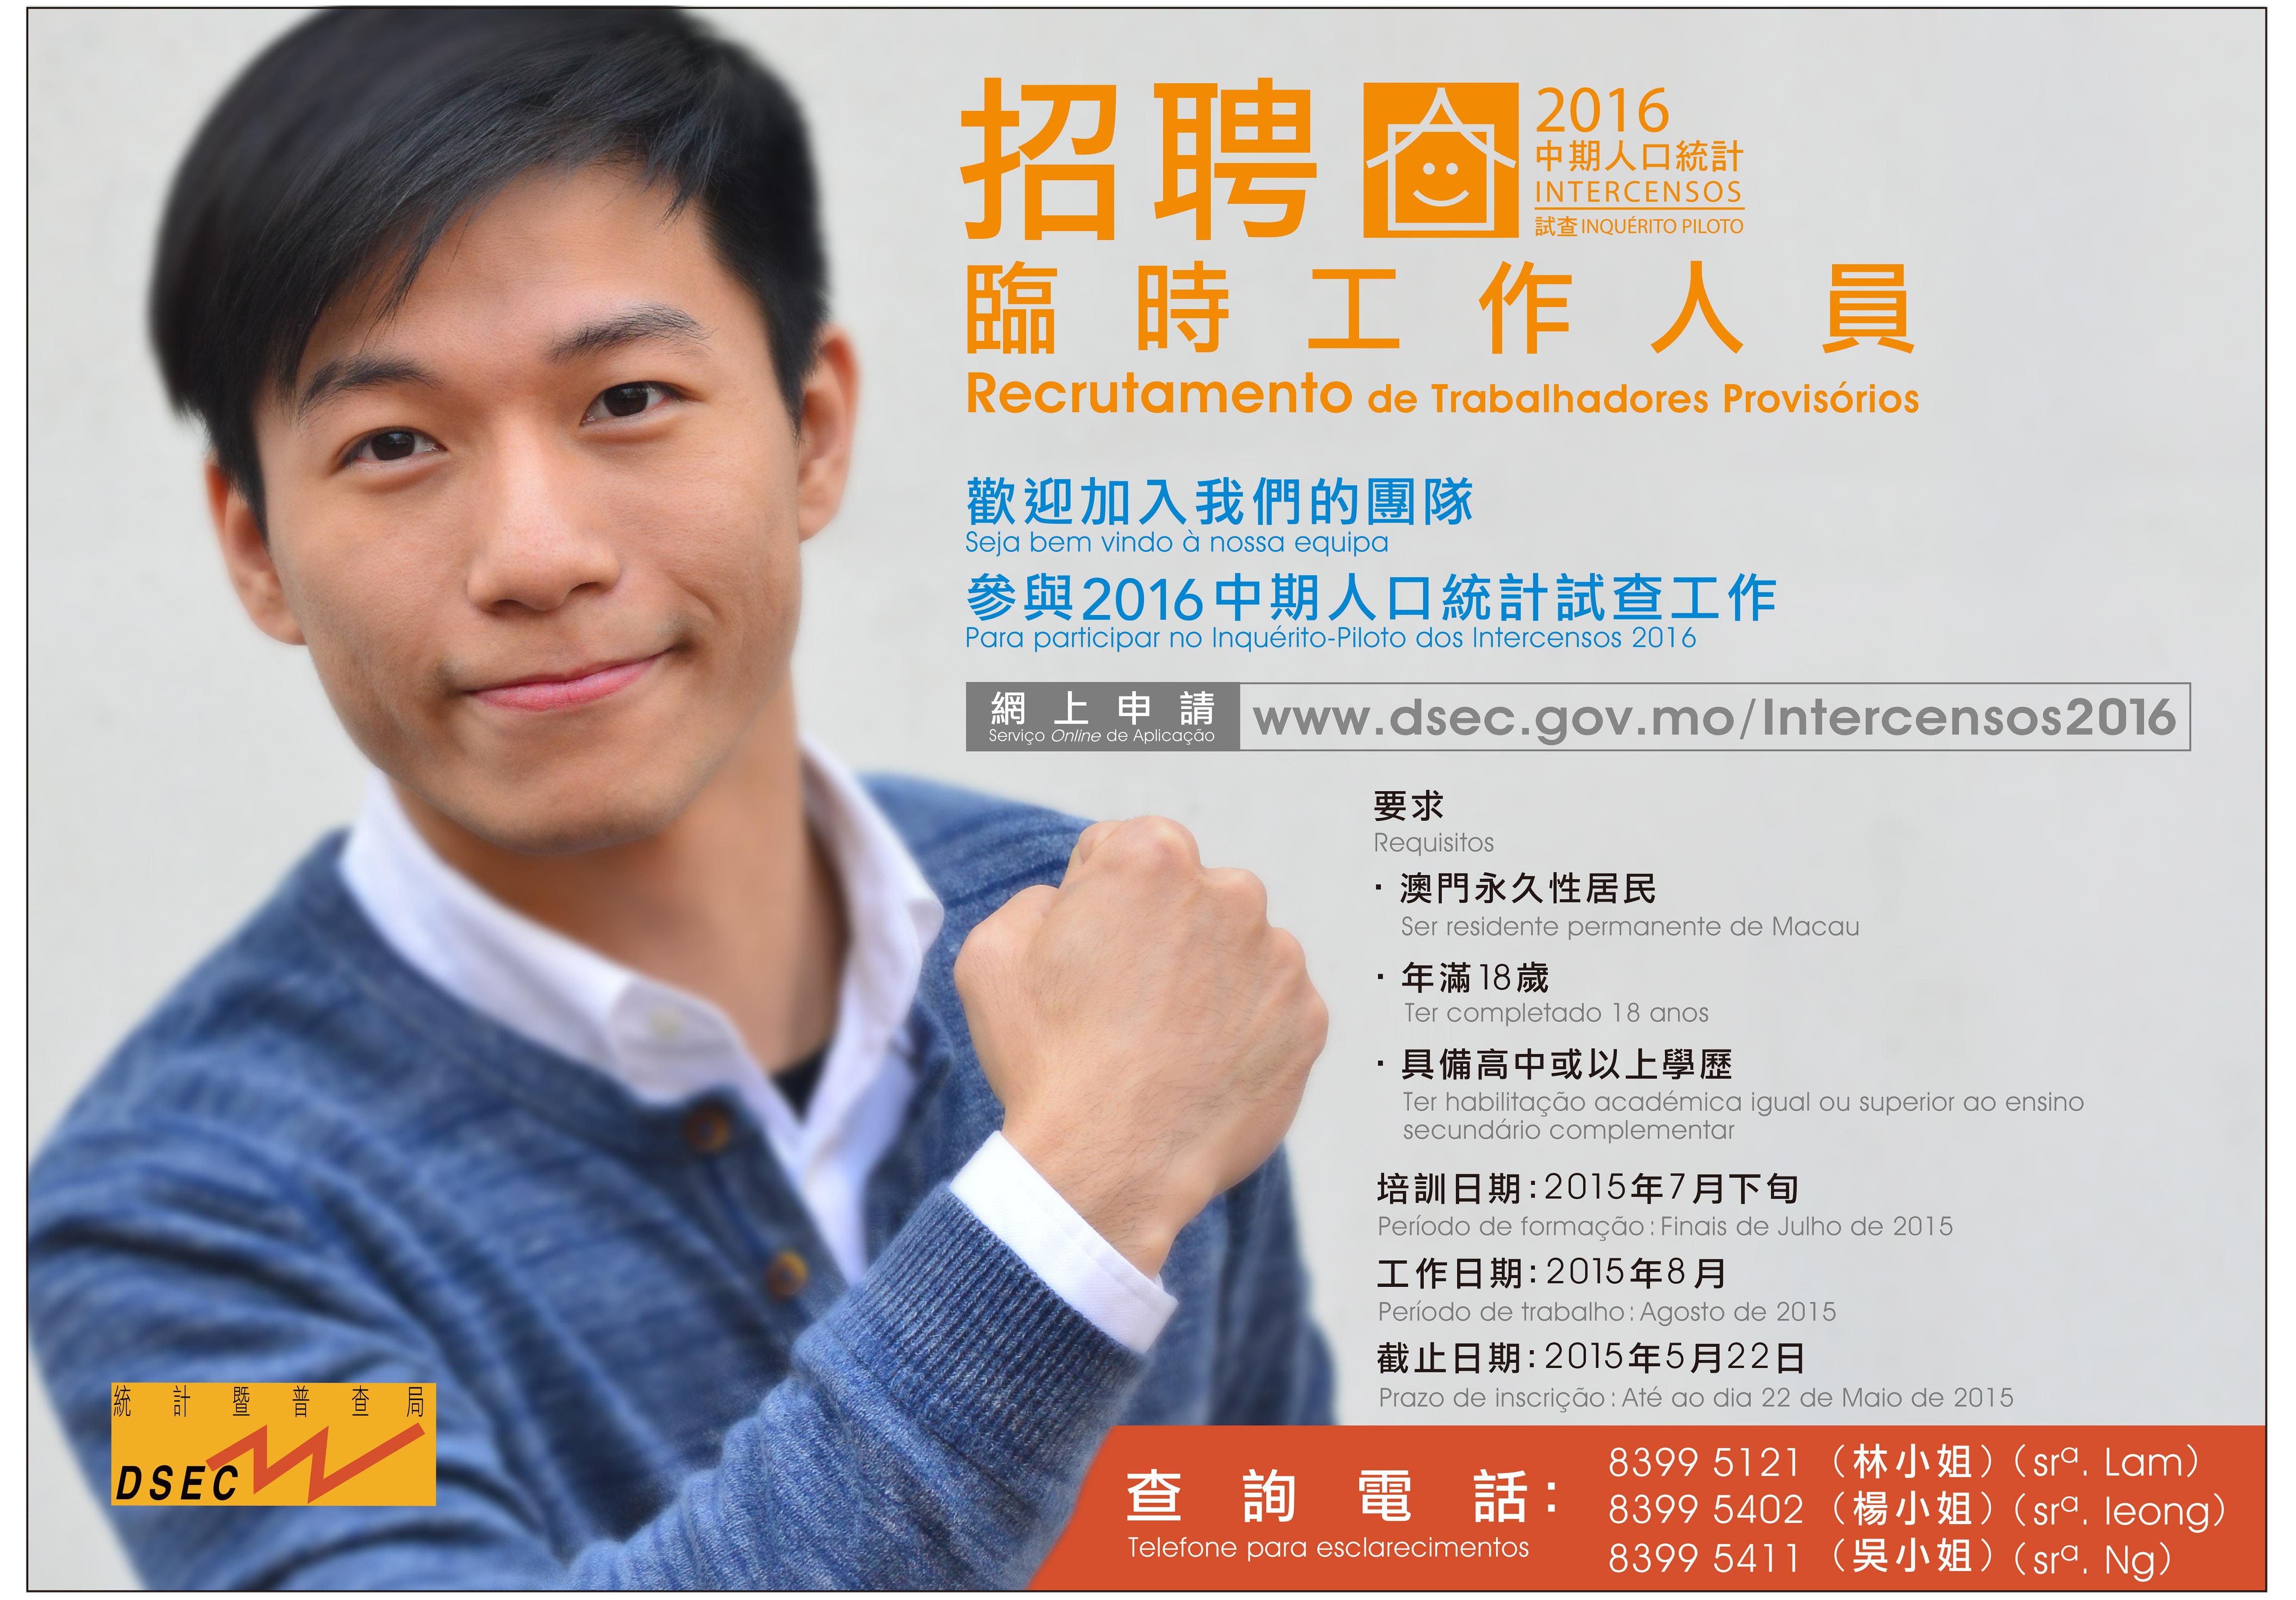 DSEC poster